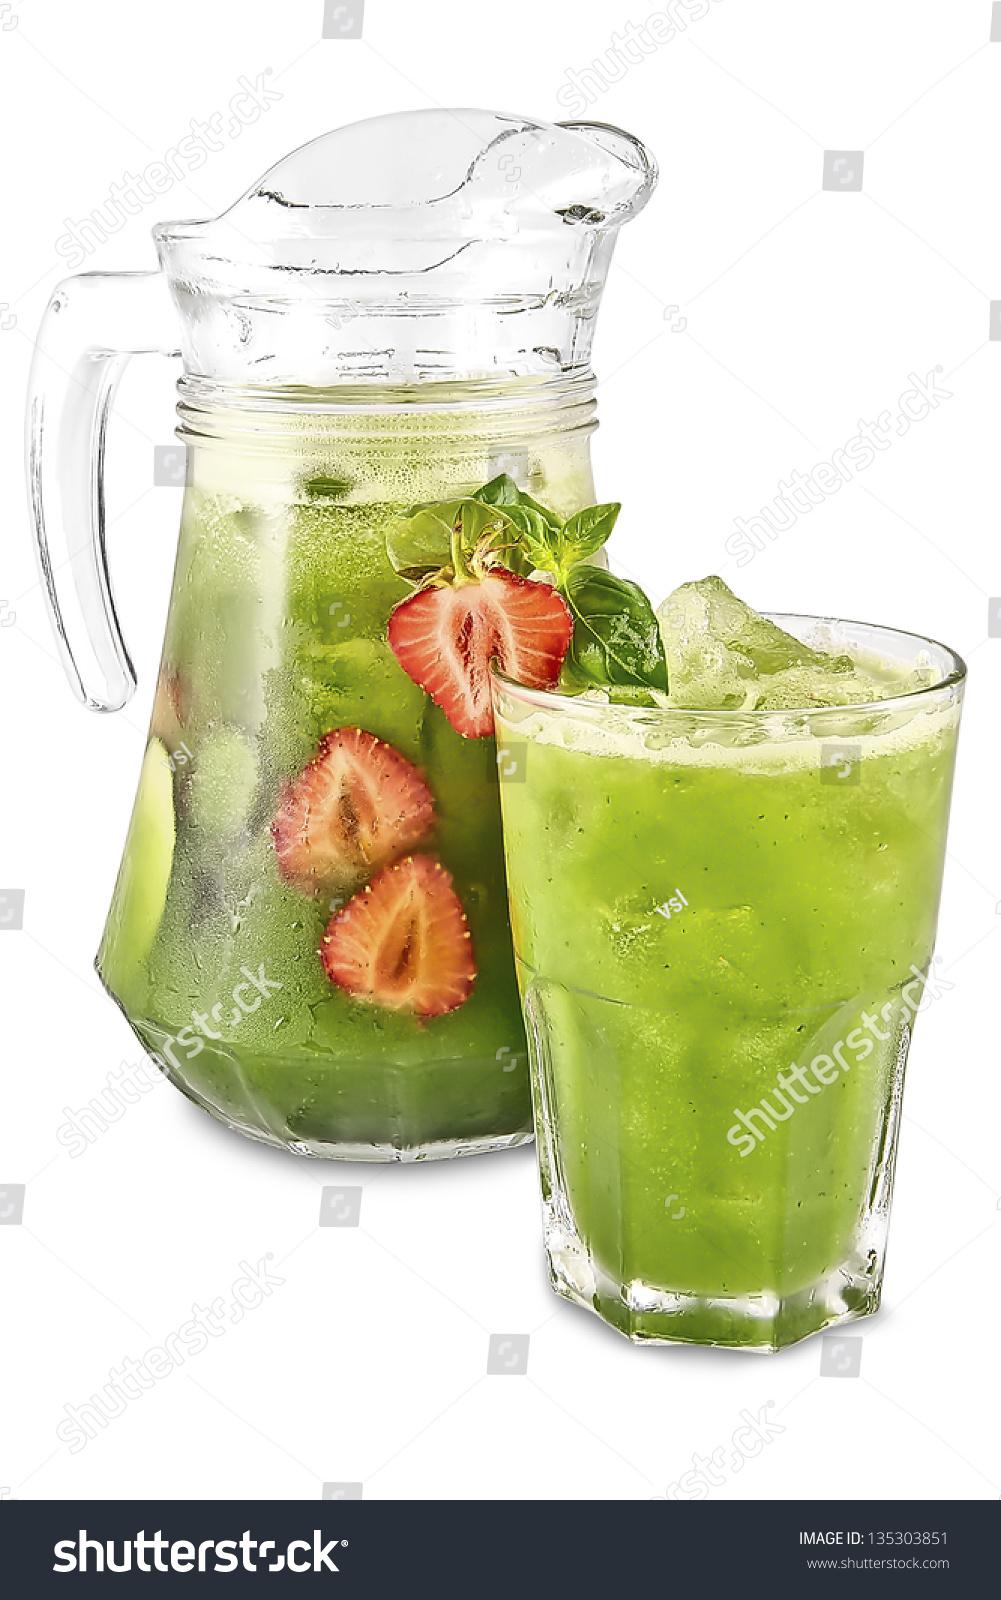 Cucumber-Basil Lemonade Stock Photo 135303851 : Shutterstock